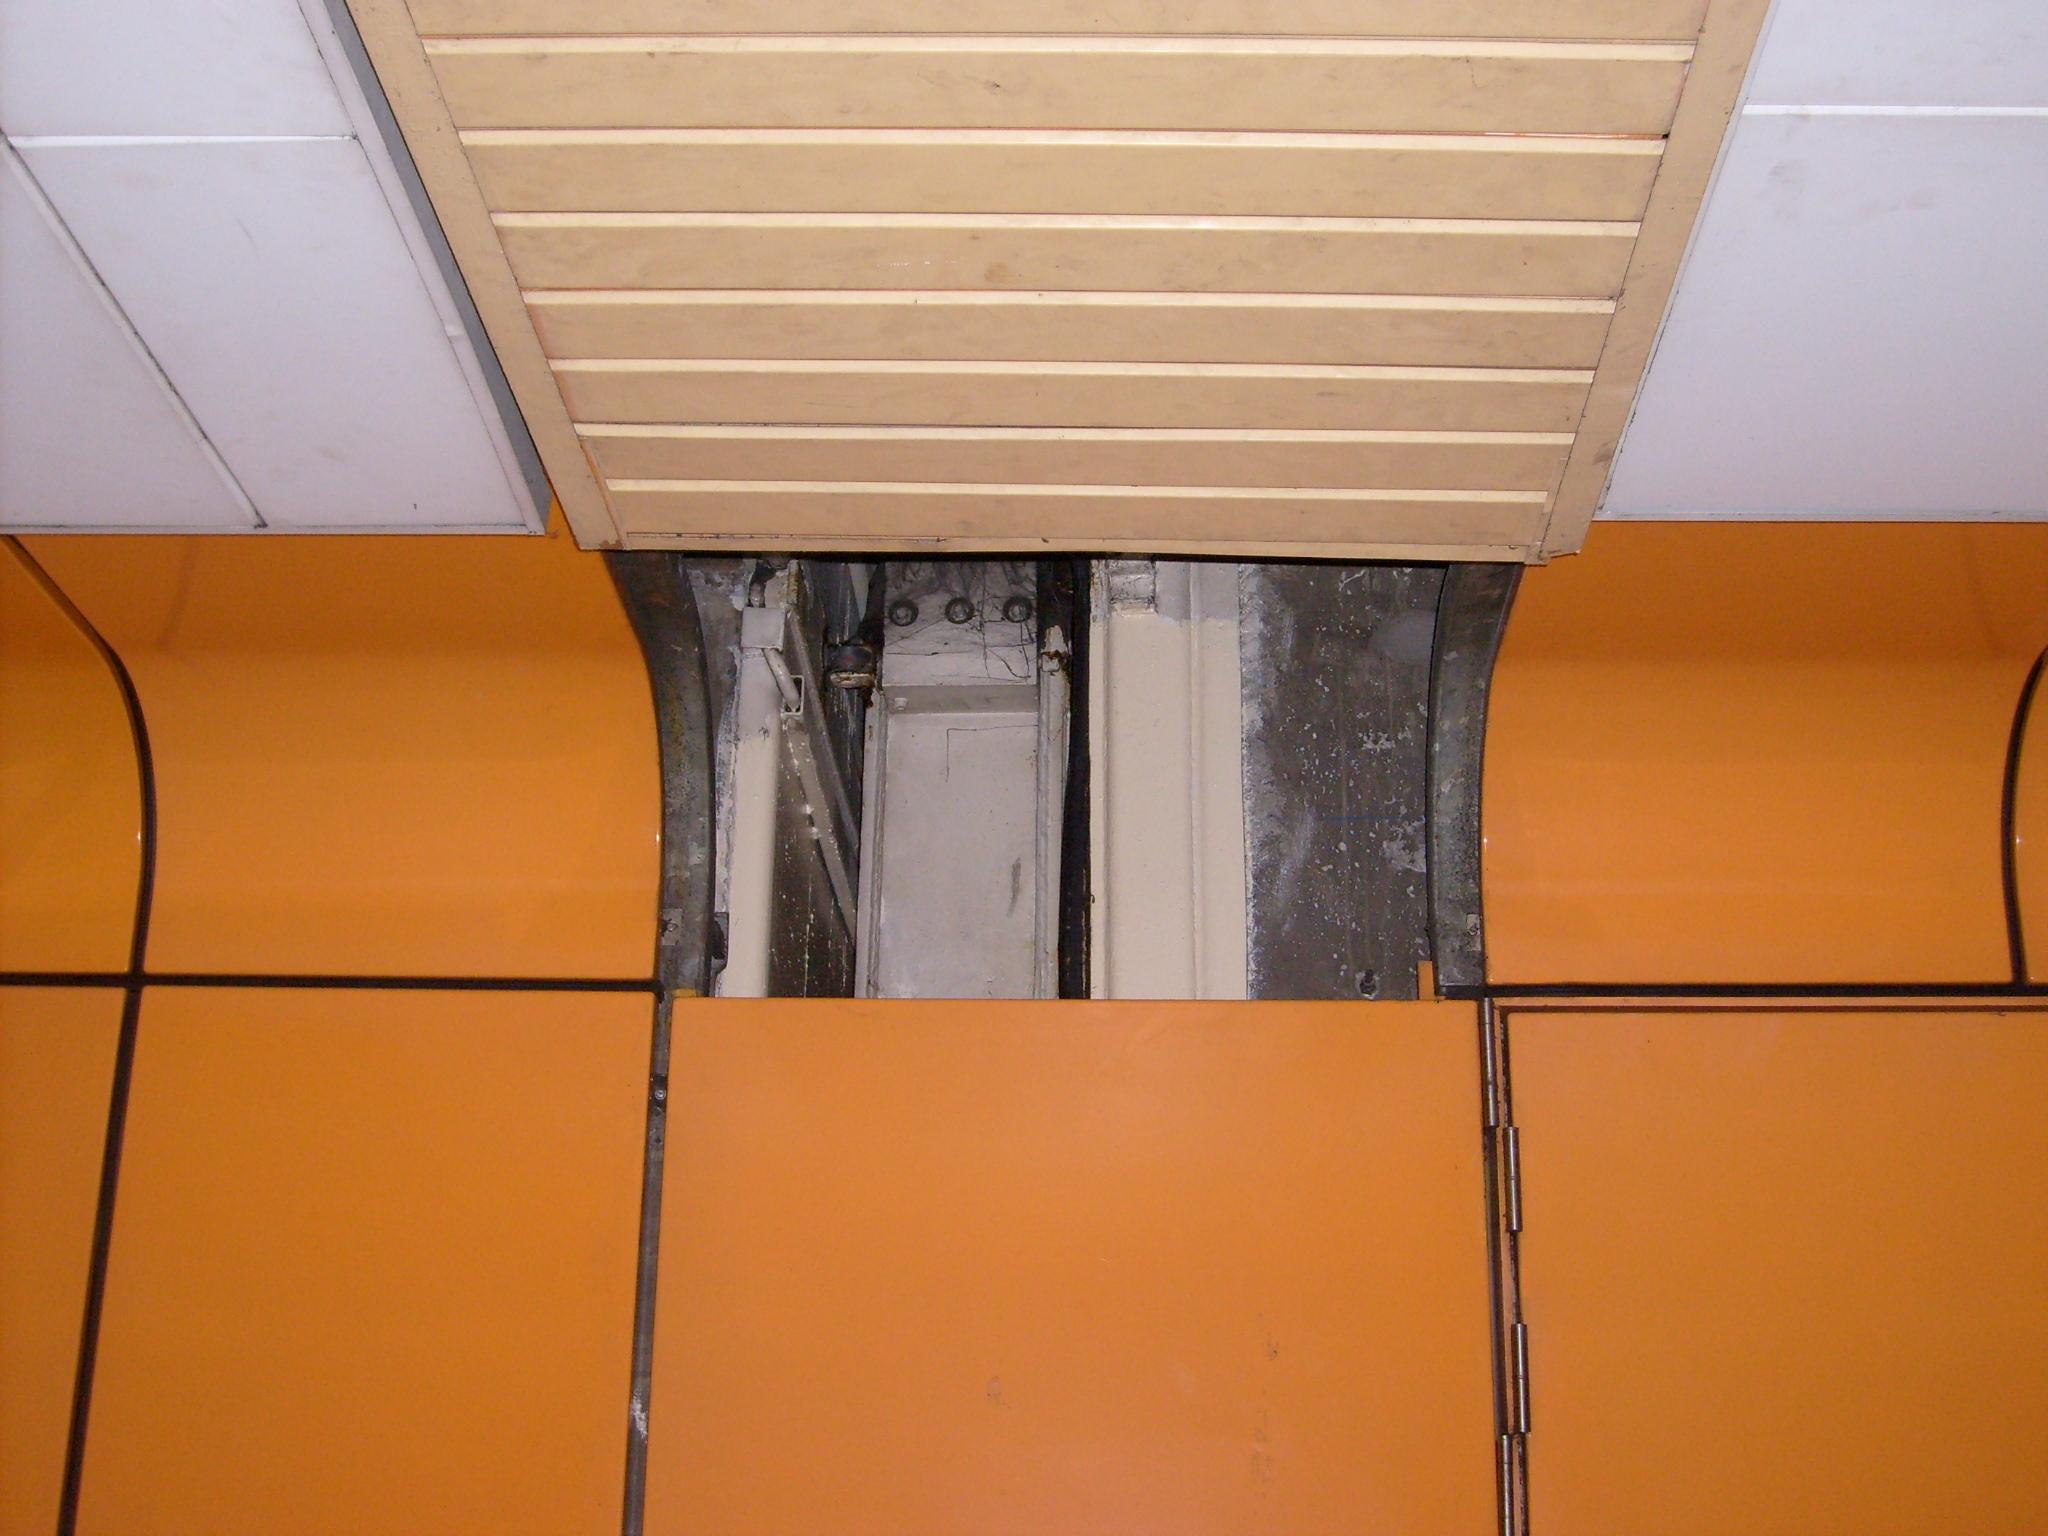 FileSubway Shelter Blast Door.JPG & File:Subway Shelter Blast Door.JPG - Wikimedia Commons